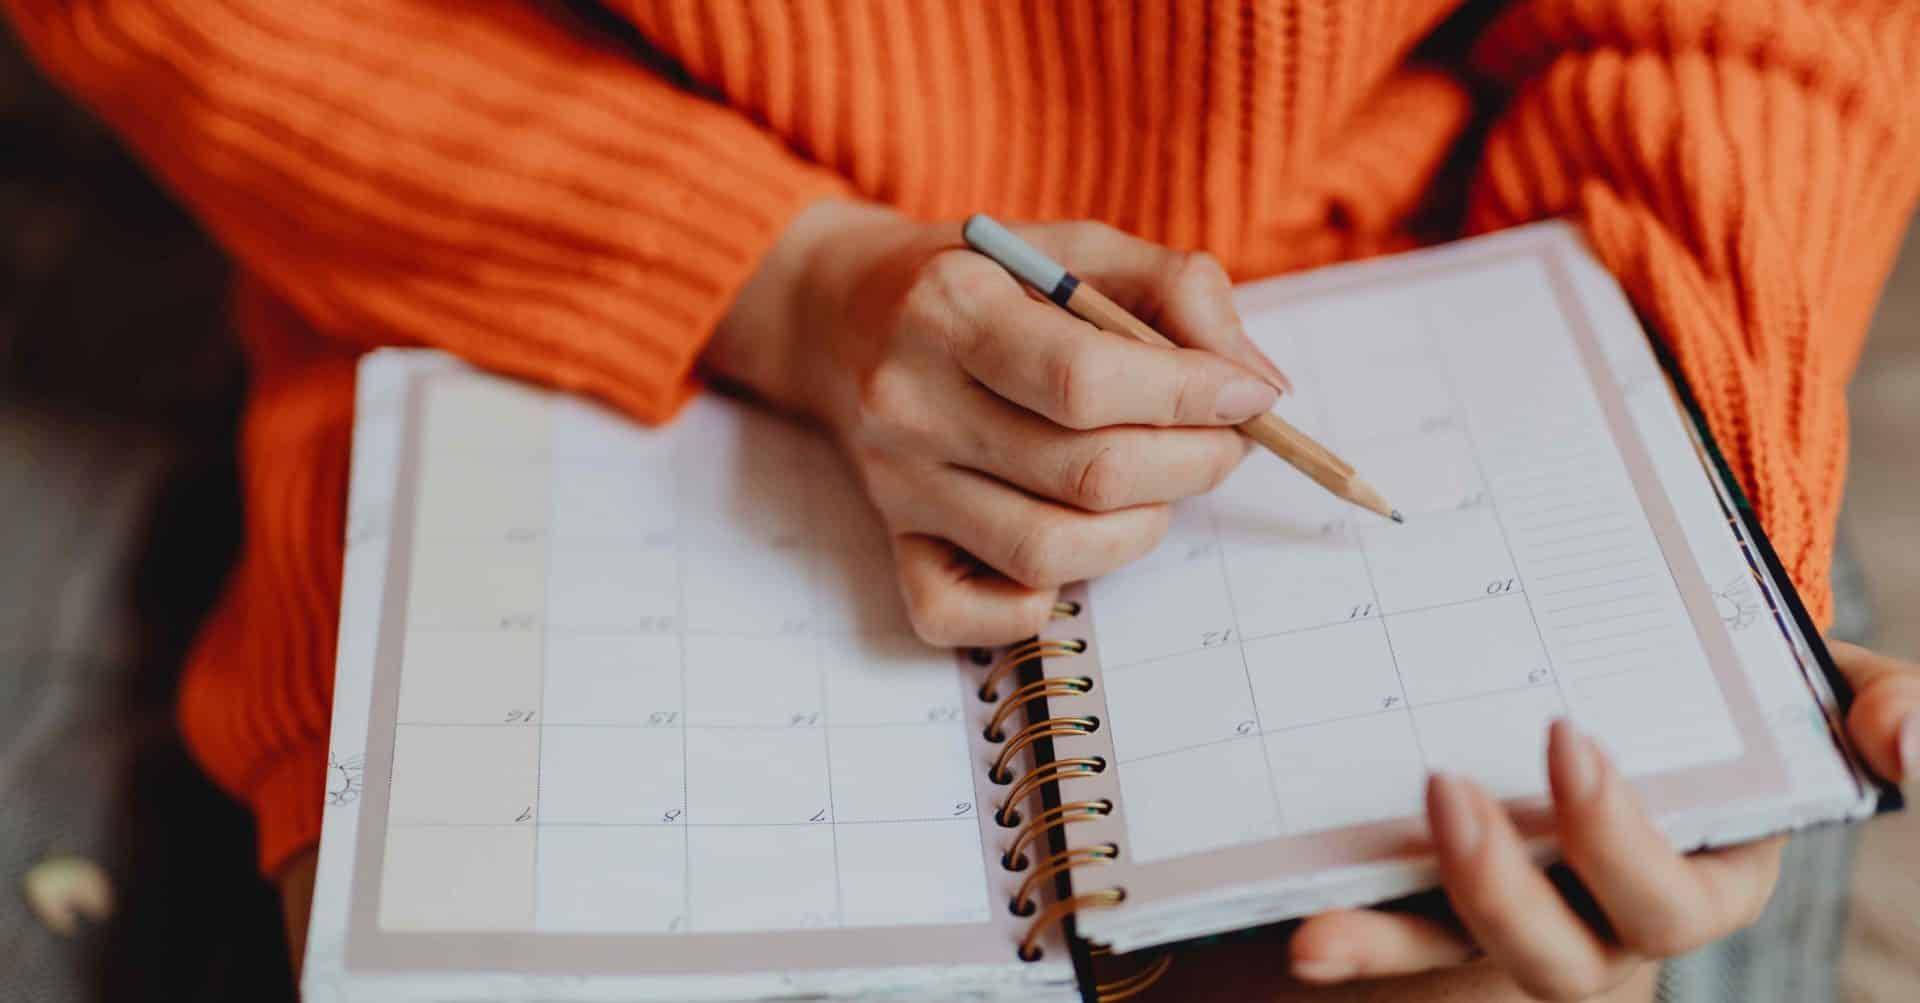 Should Product Roadmaps Have Dates?